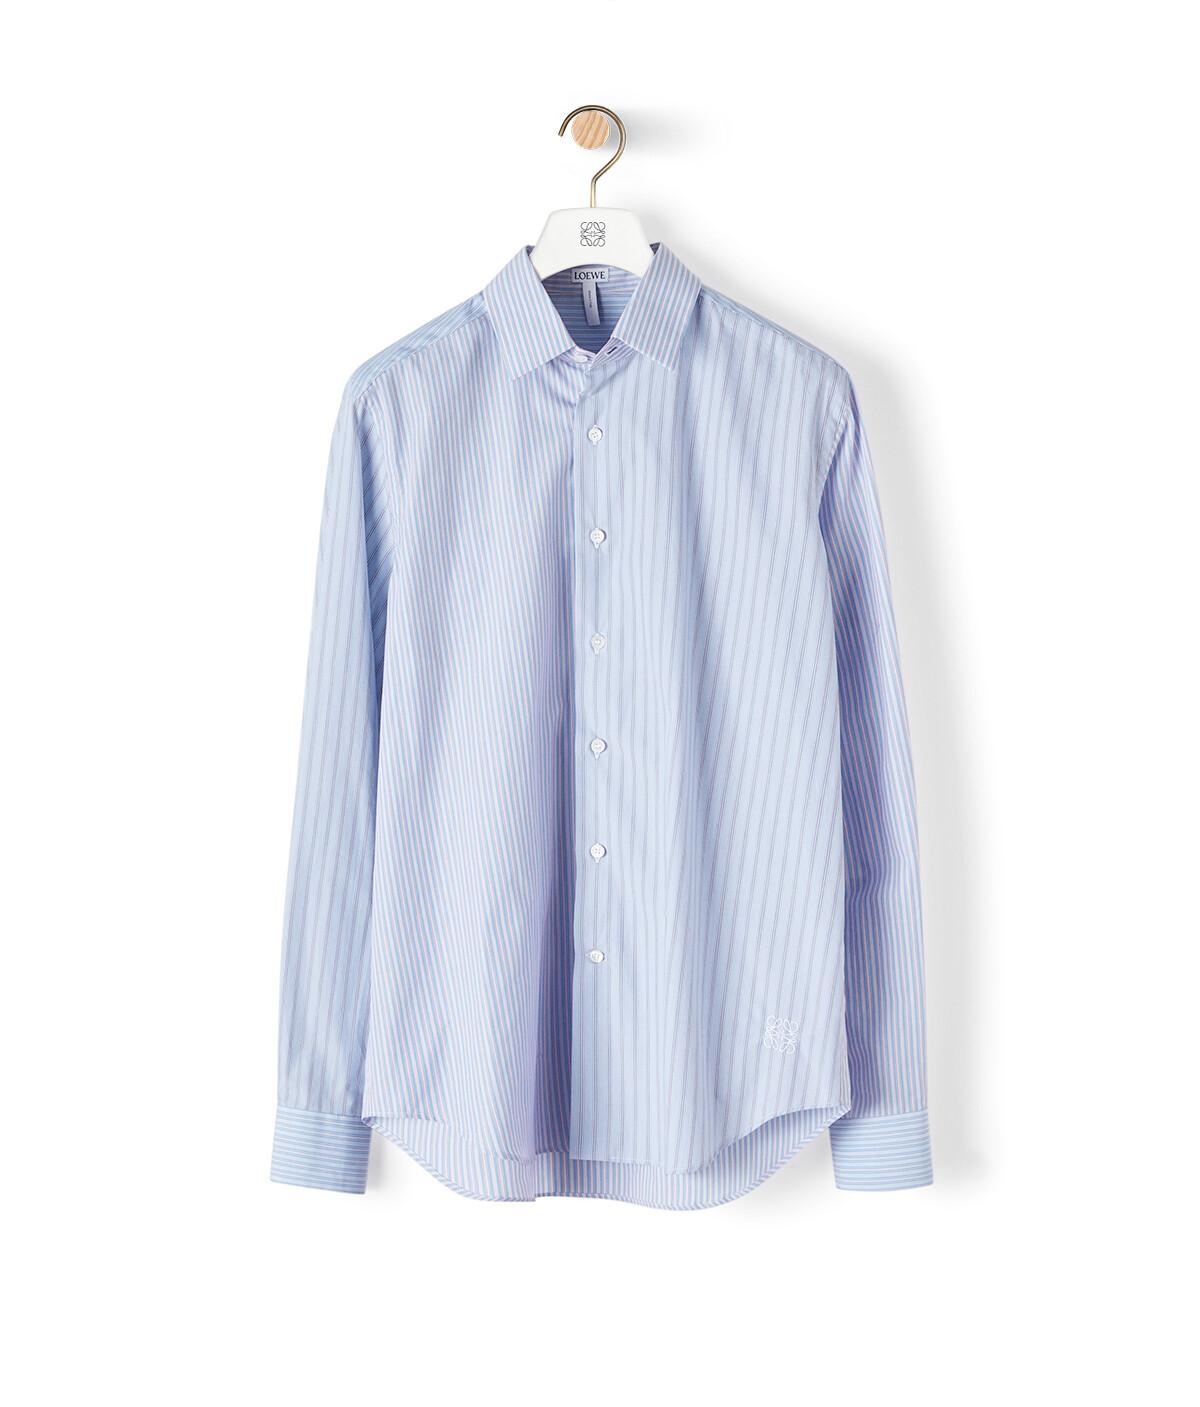 LOEWE Stripe Shirt Blue/Red/White front